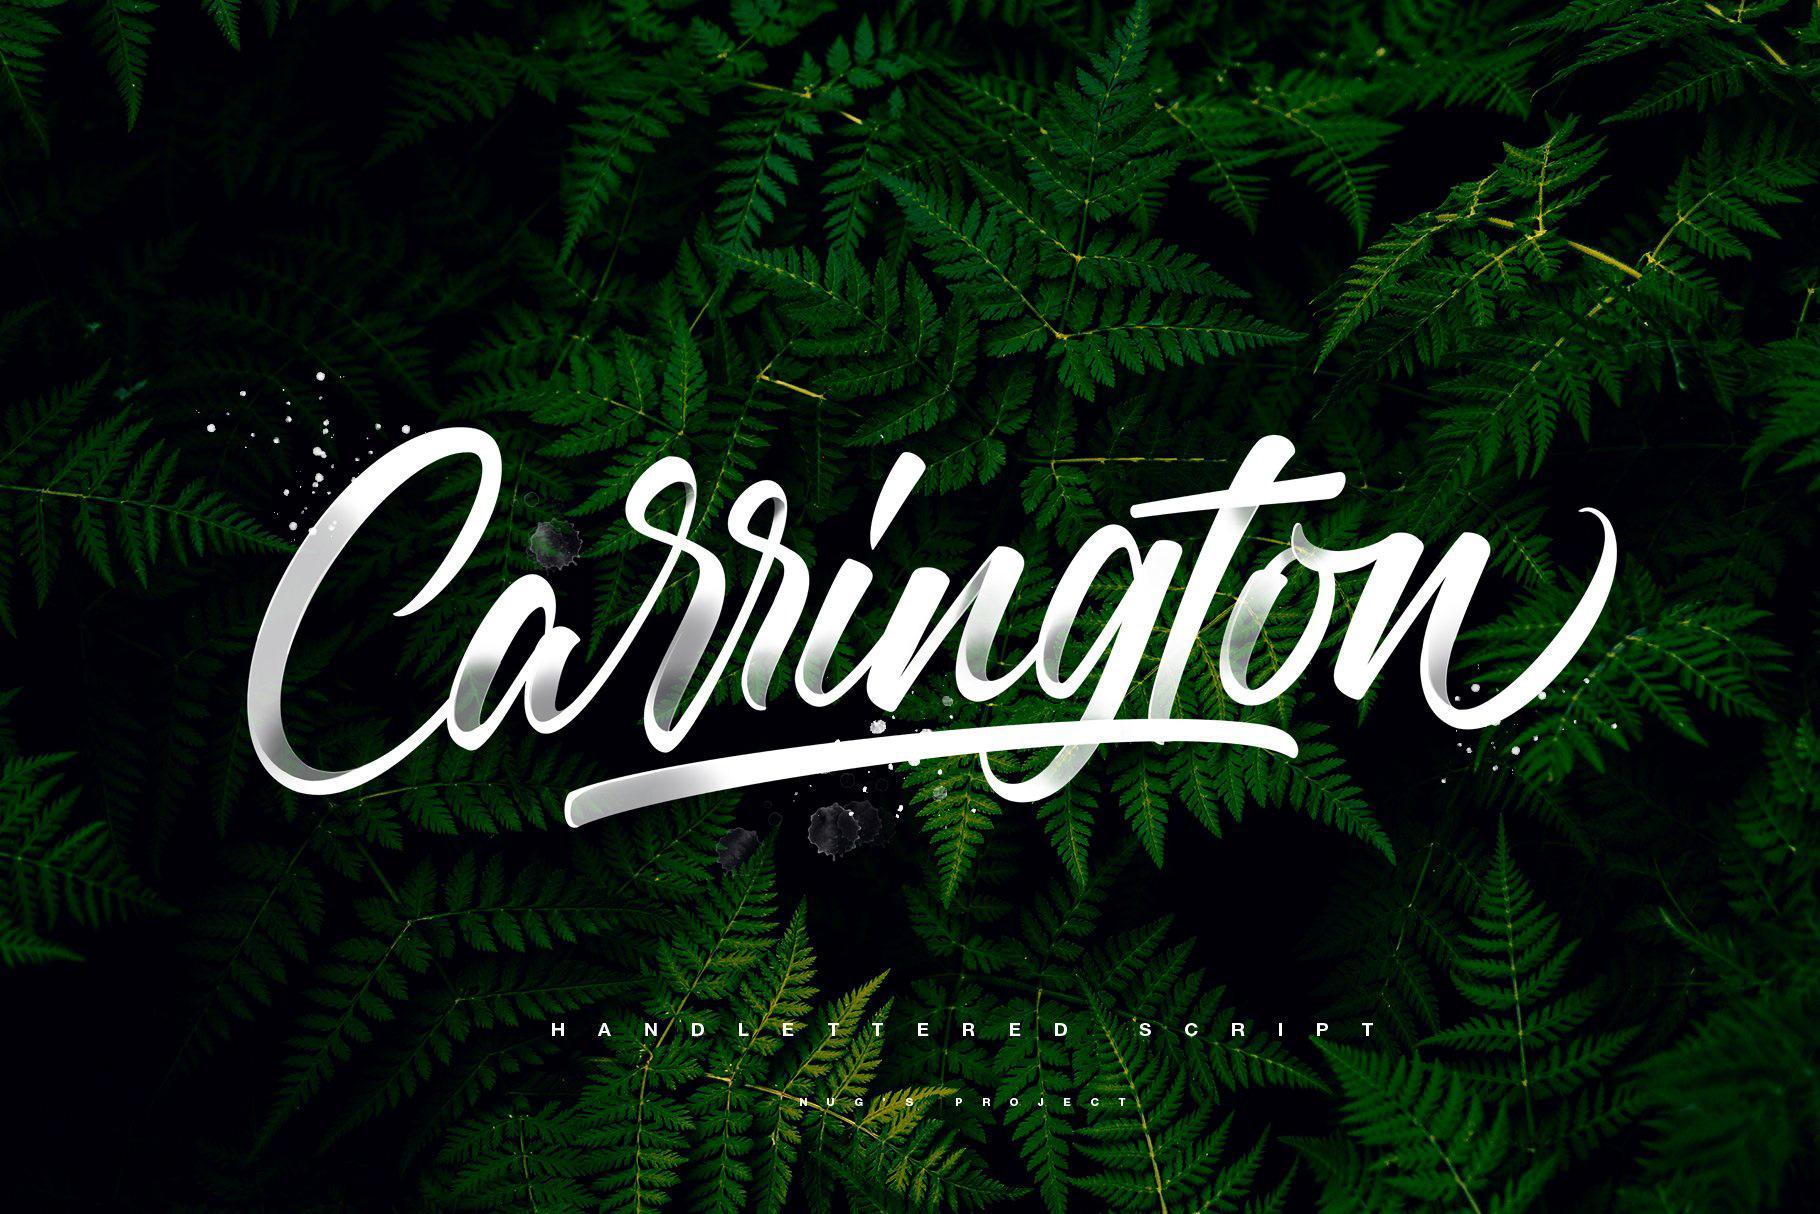 Carrington Free Font - sans-serif